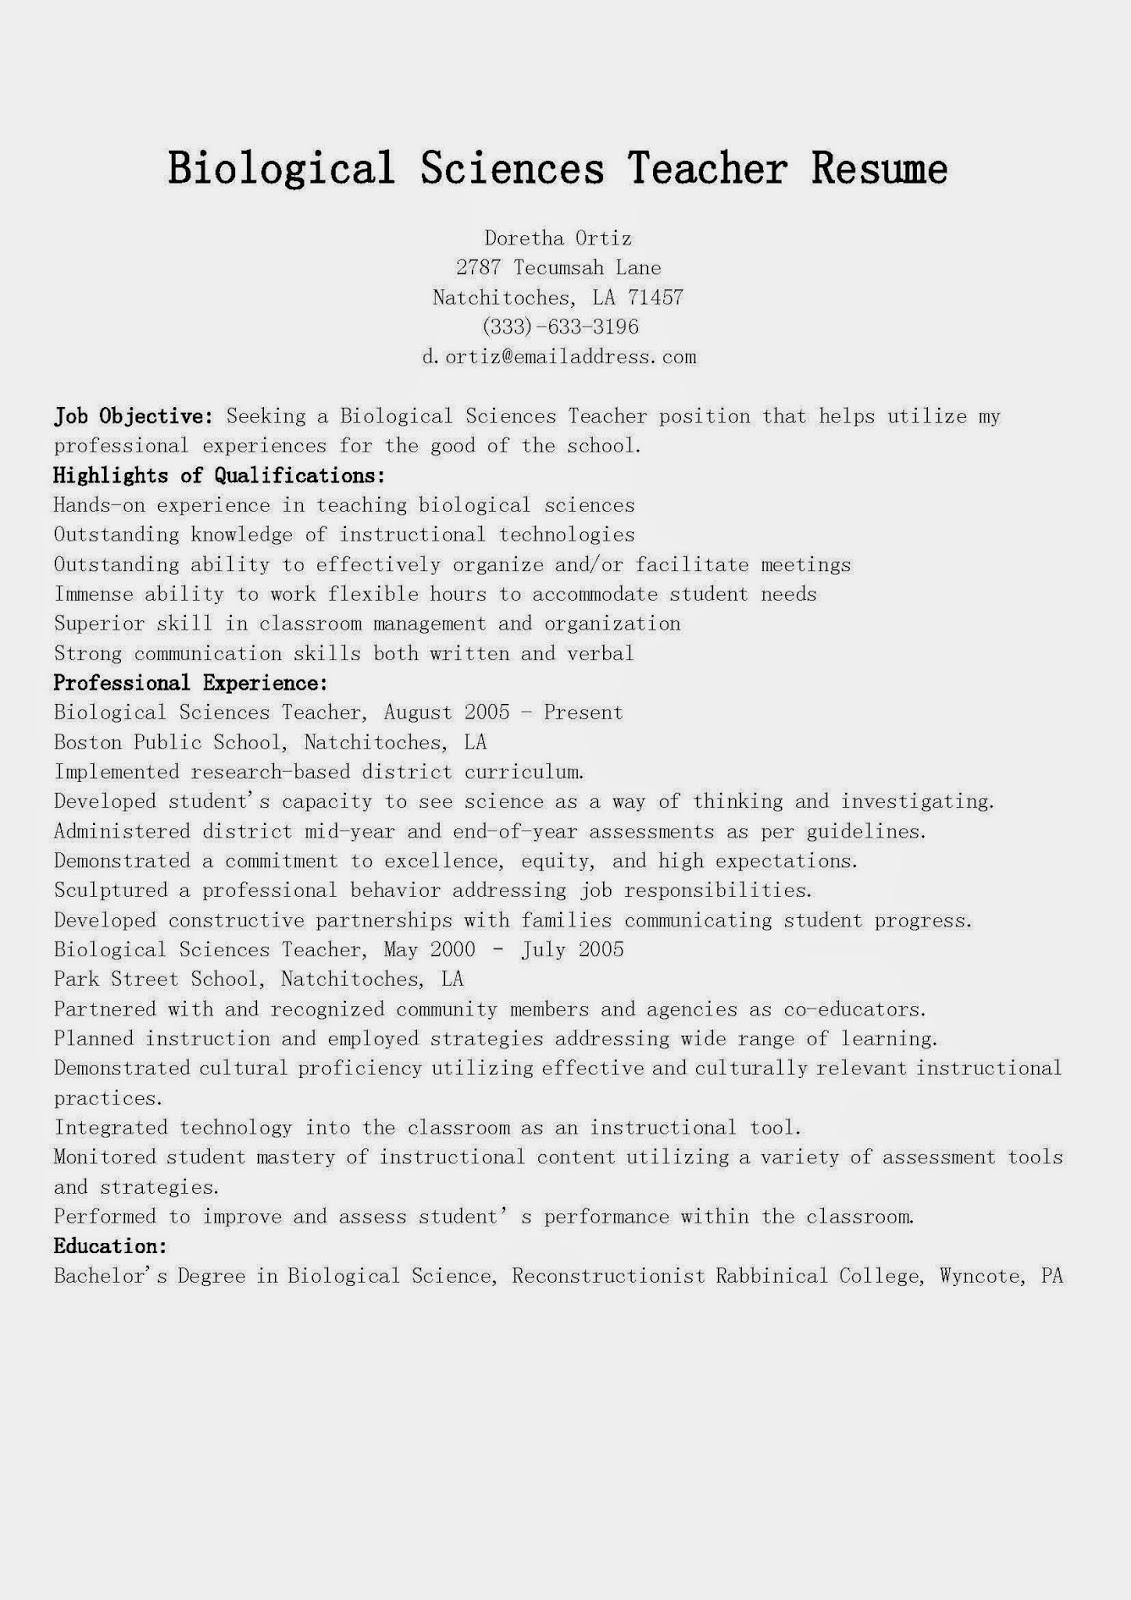 resume samples  biological sciences teacher resume sample